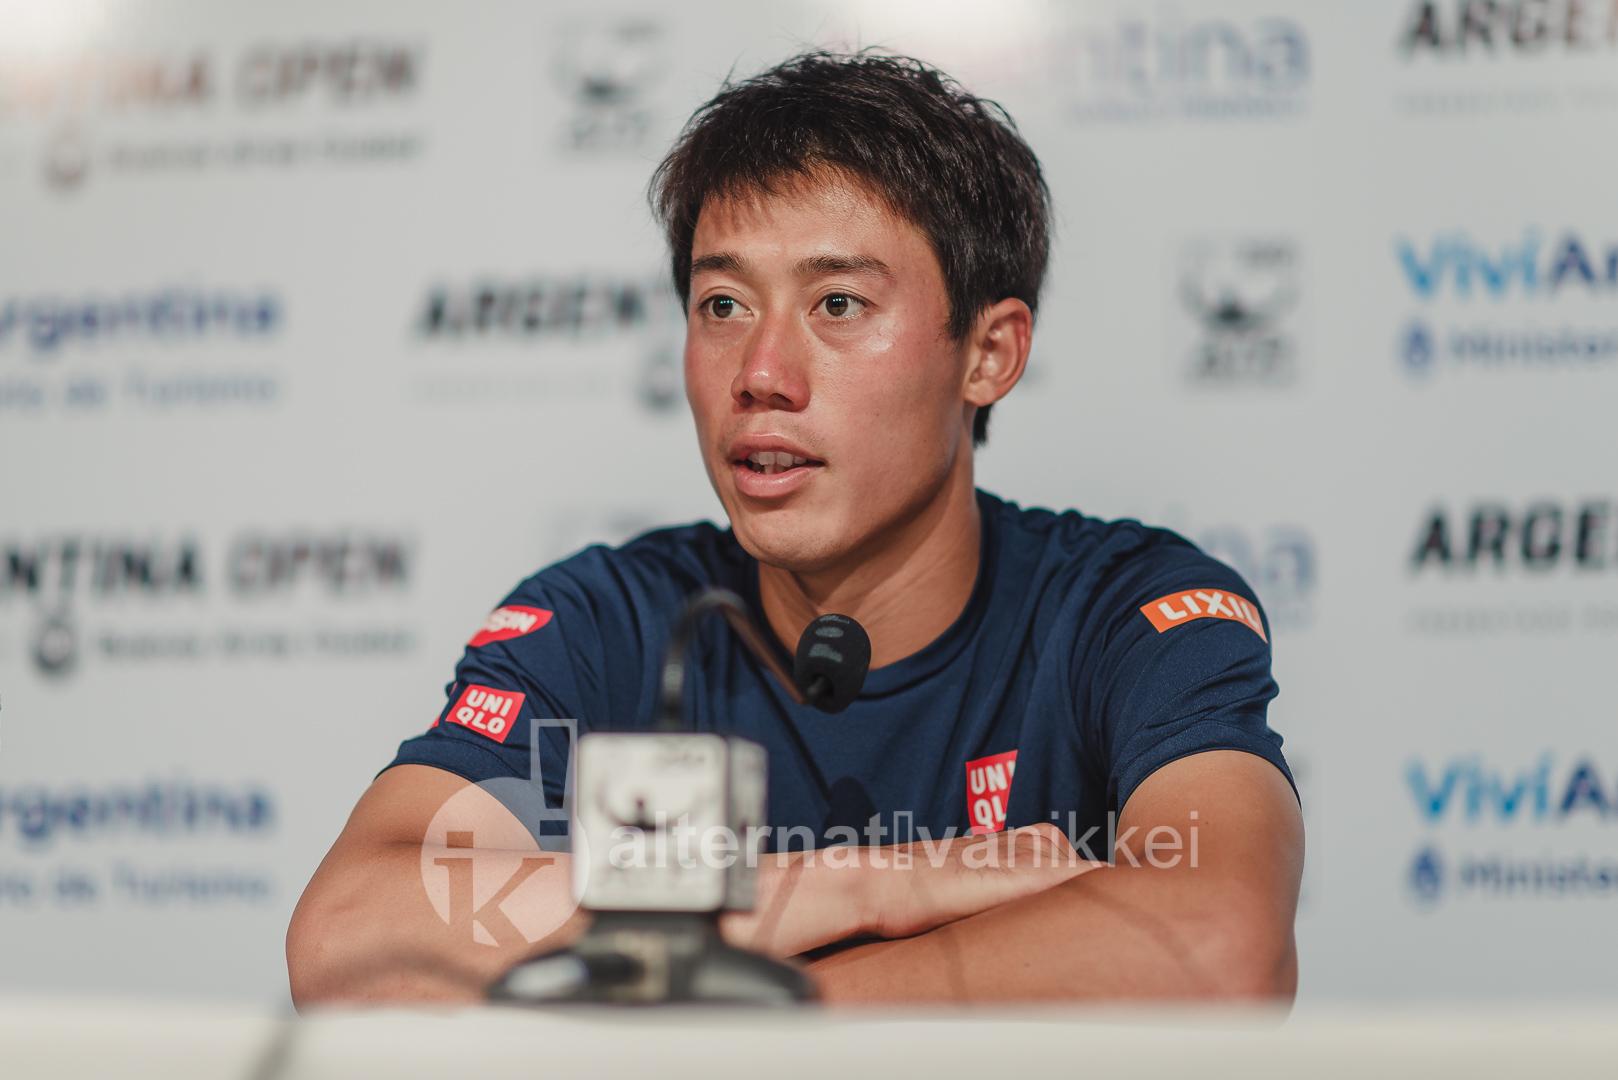 Kei Nishikori habló en conferencia de prensa tras la derrota / Foto: Jason Kung Web de Jason Kung: http://jasonkphoto.com/web/ FB Page: https://www.facebook.com/jasonkphotostudio/